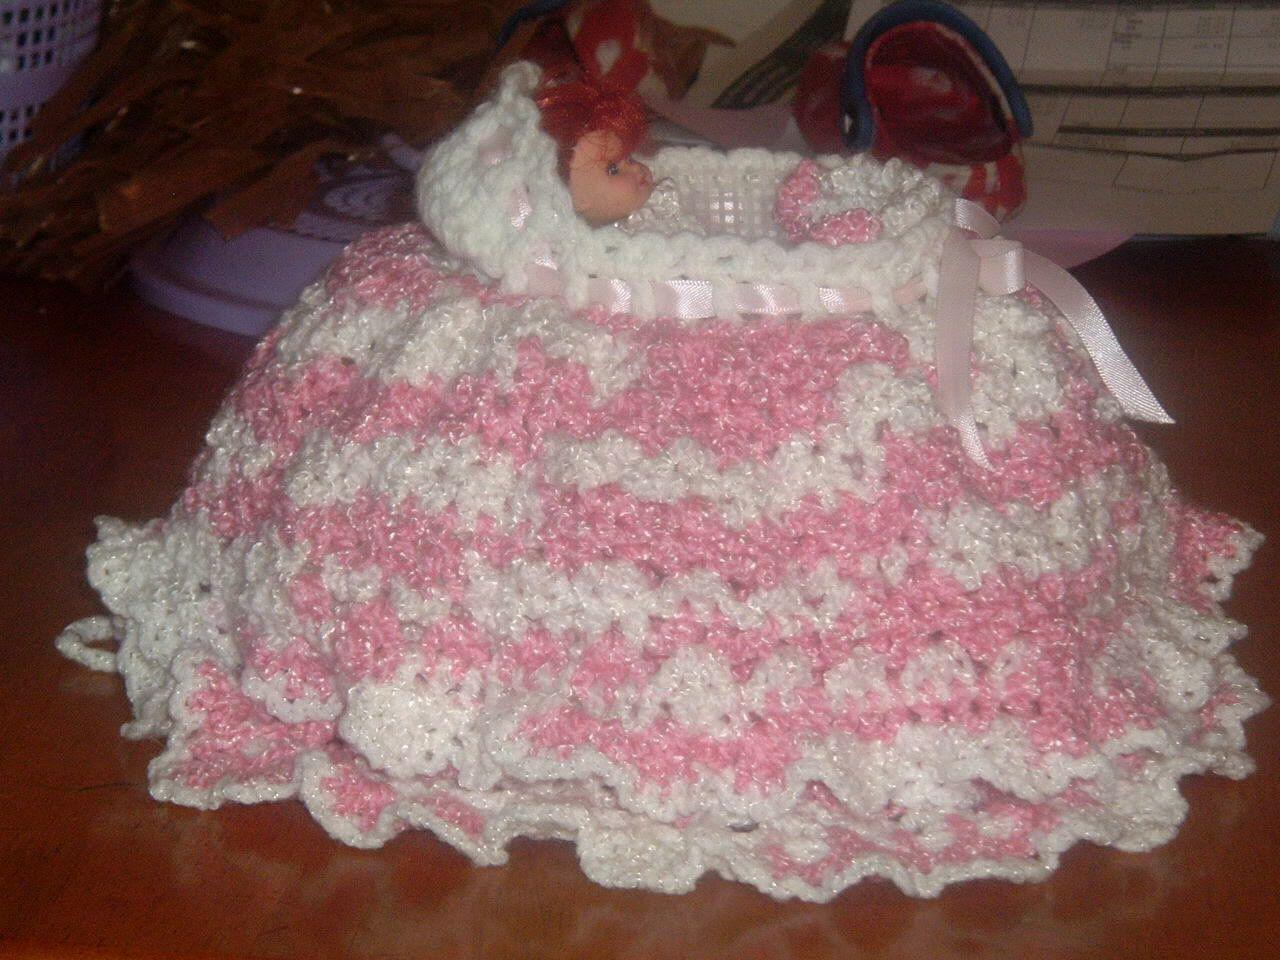 crochet cradle purse pattern | IMG]http://i82.photobucket.com/albums ...